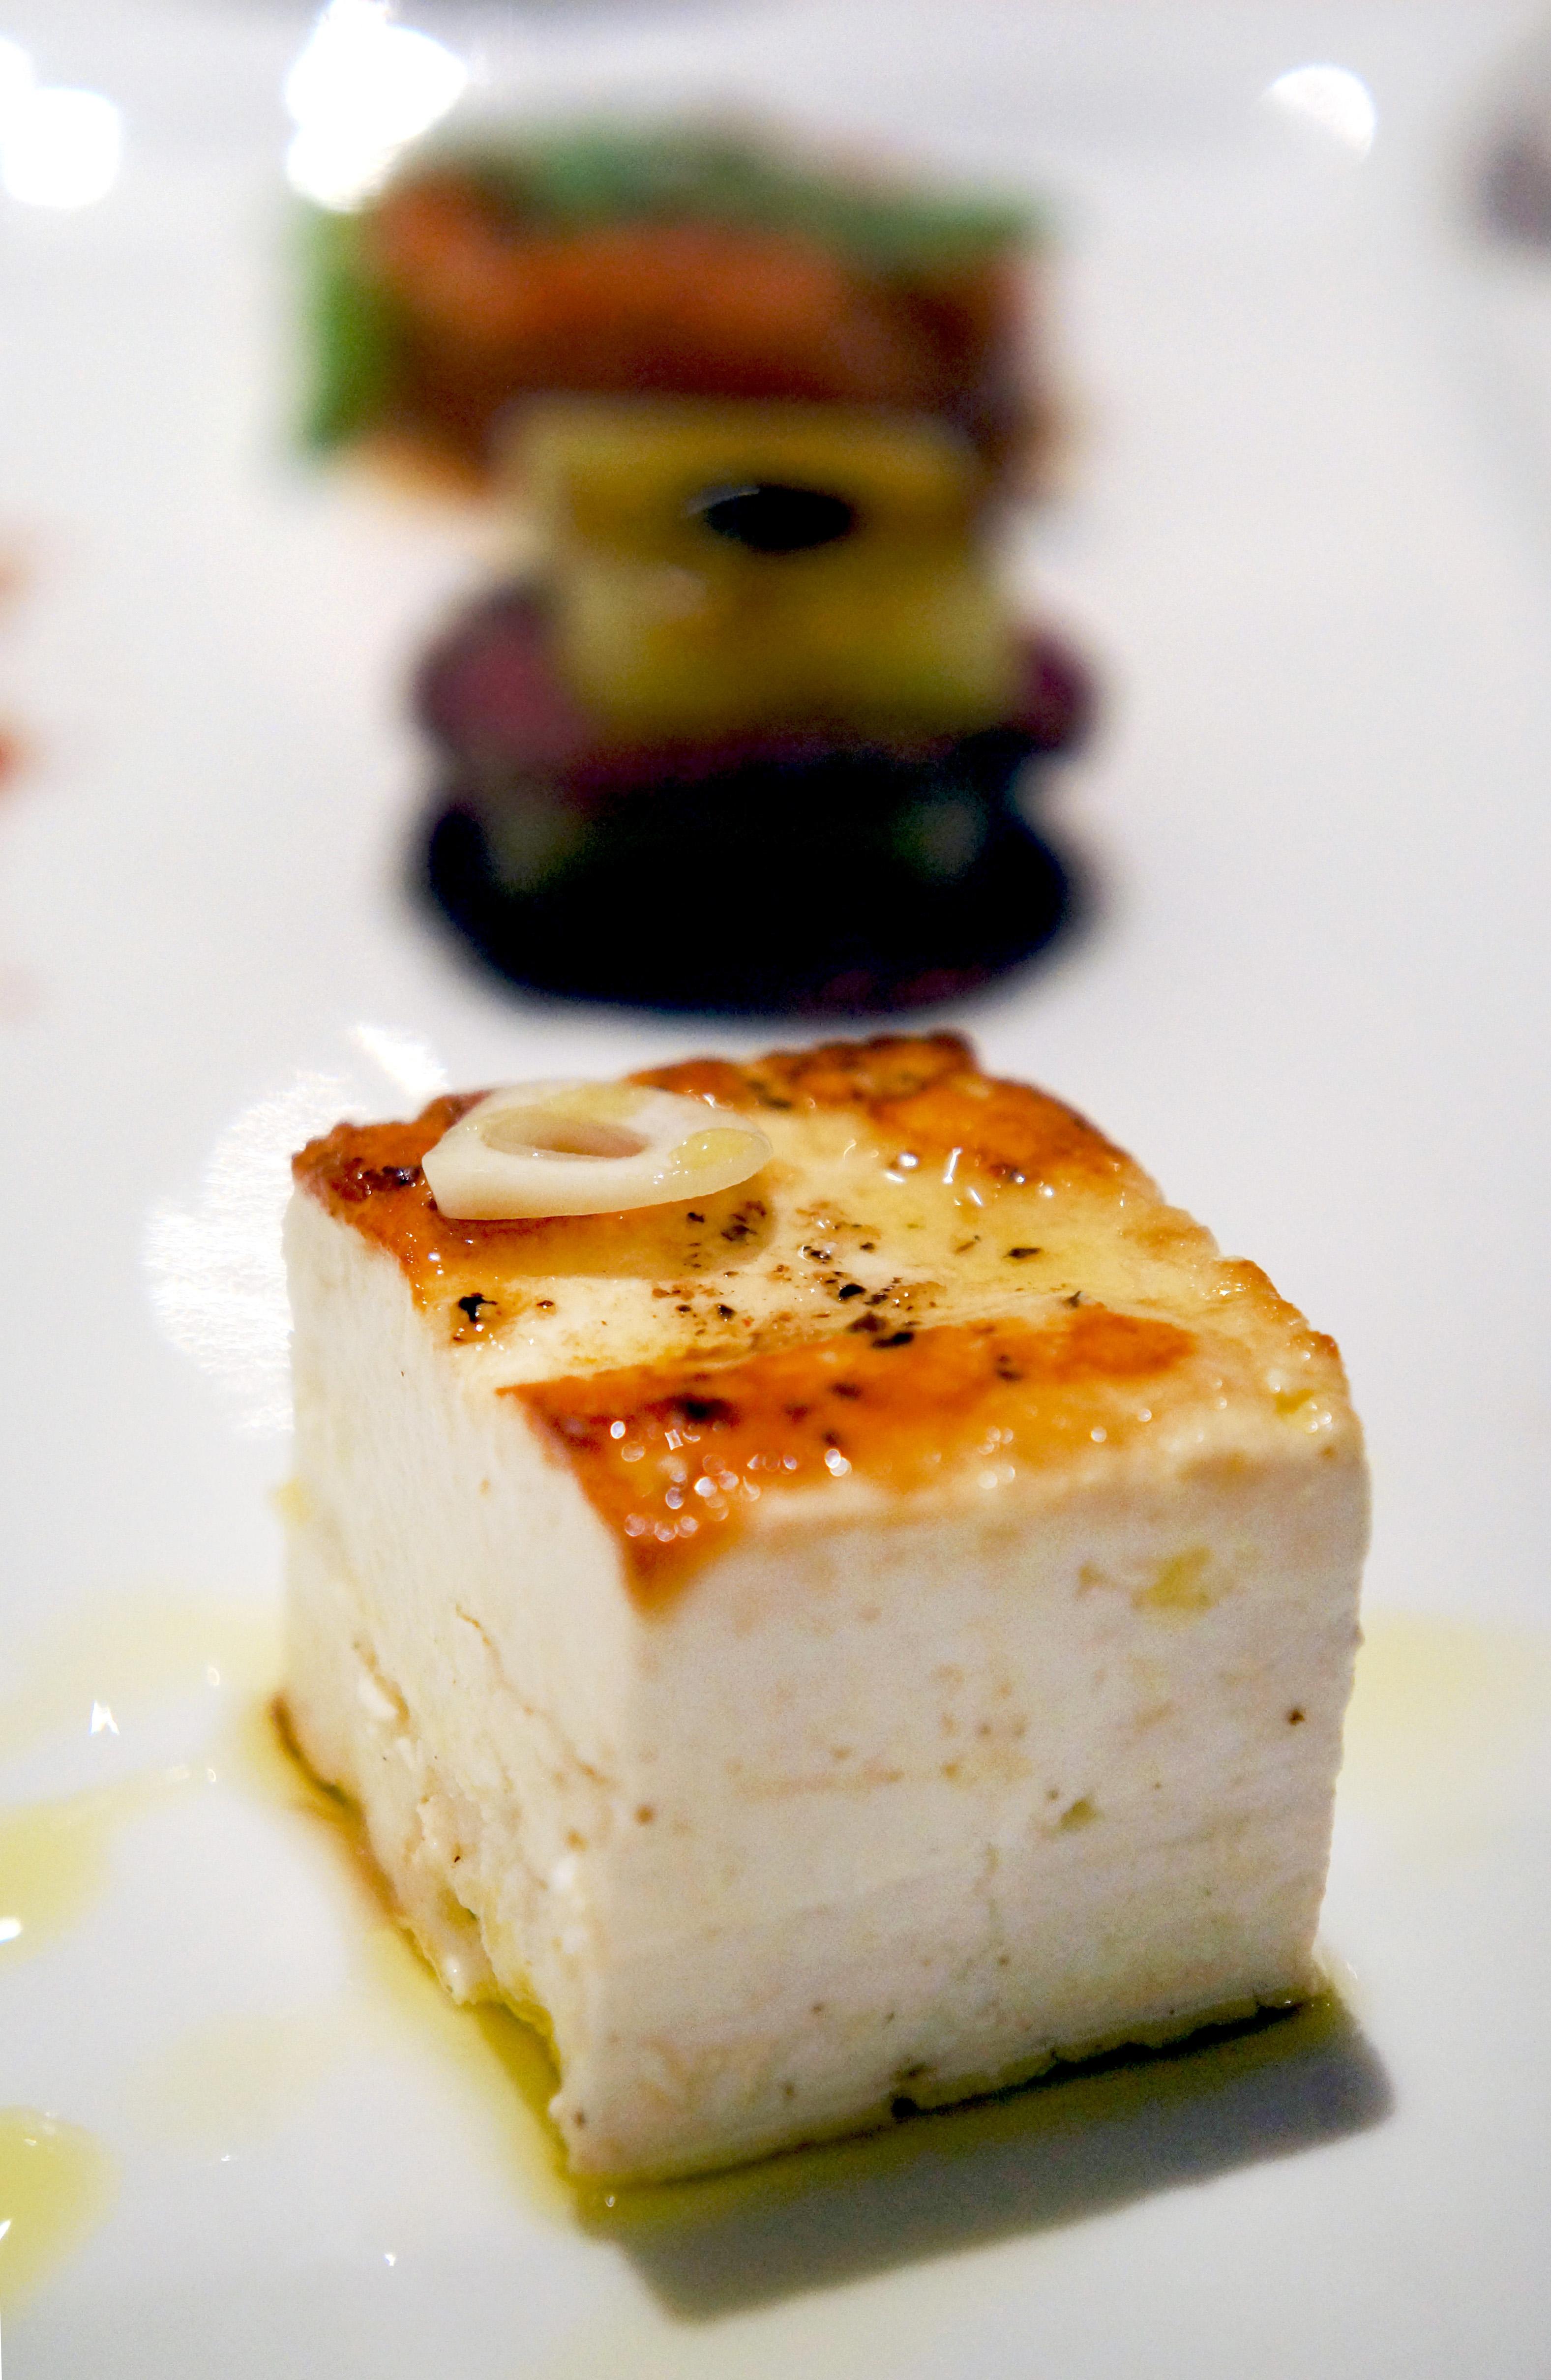 grilovani kozji sir, goveđi karpaćo sa sorbeom od dinje i tatar od paradajza